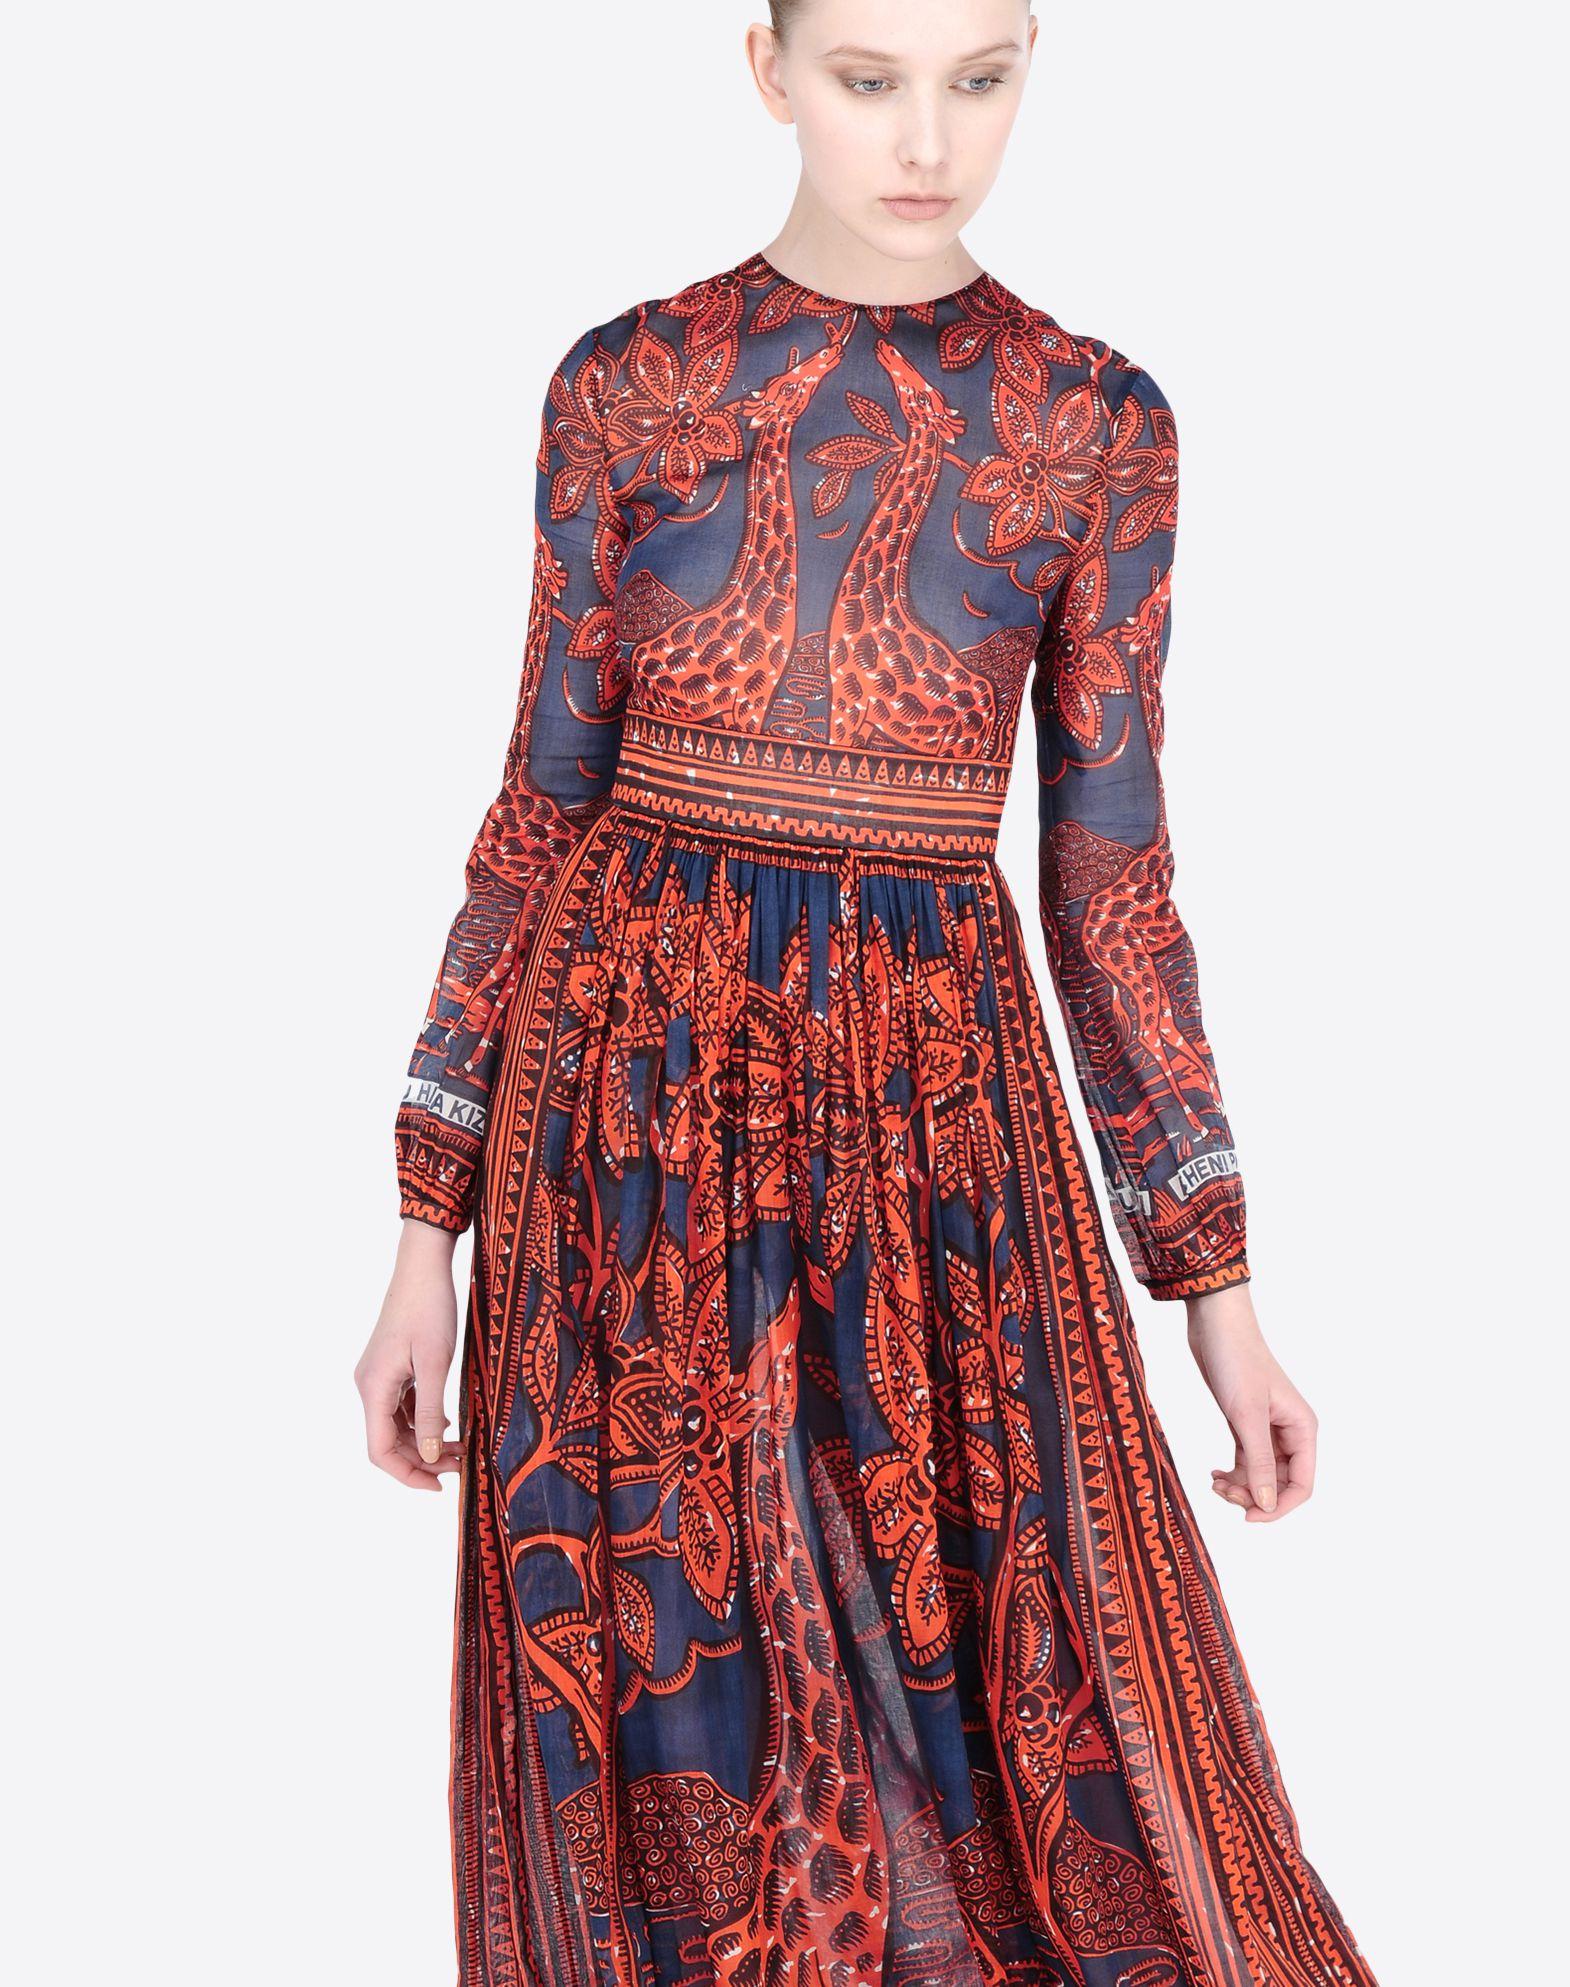 VALENTINO Frills Plain weave Round collar Ethnic design Rear zip closure Internal slip dress Long sleeves  34586074sl